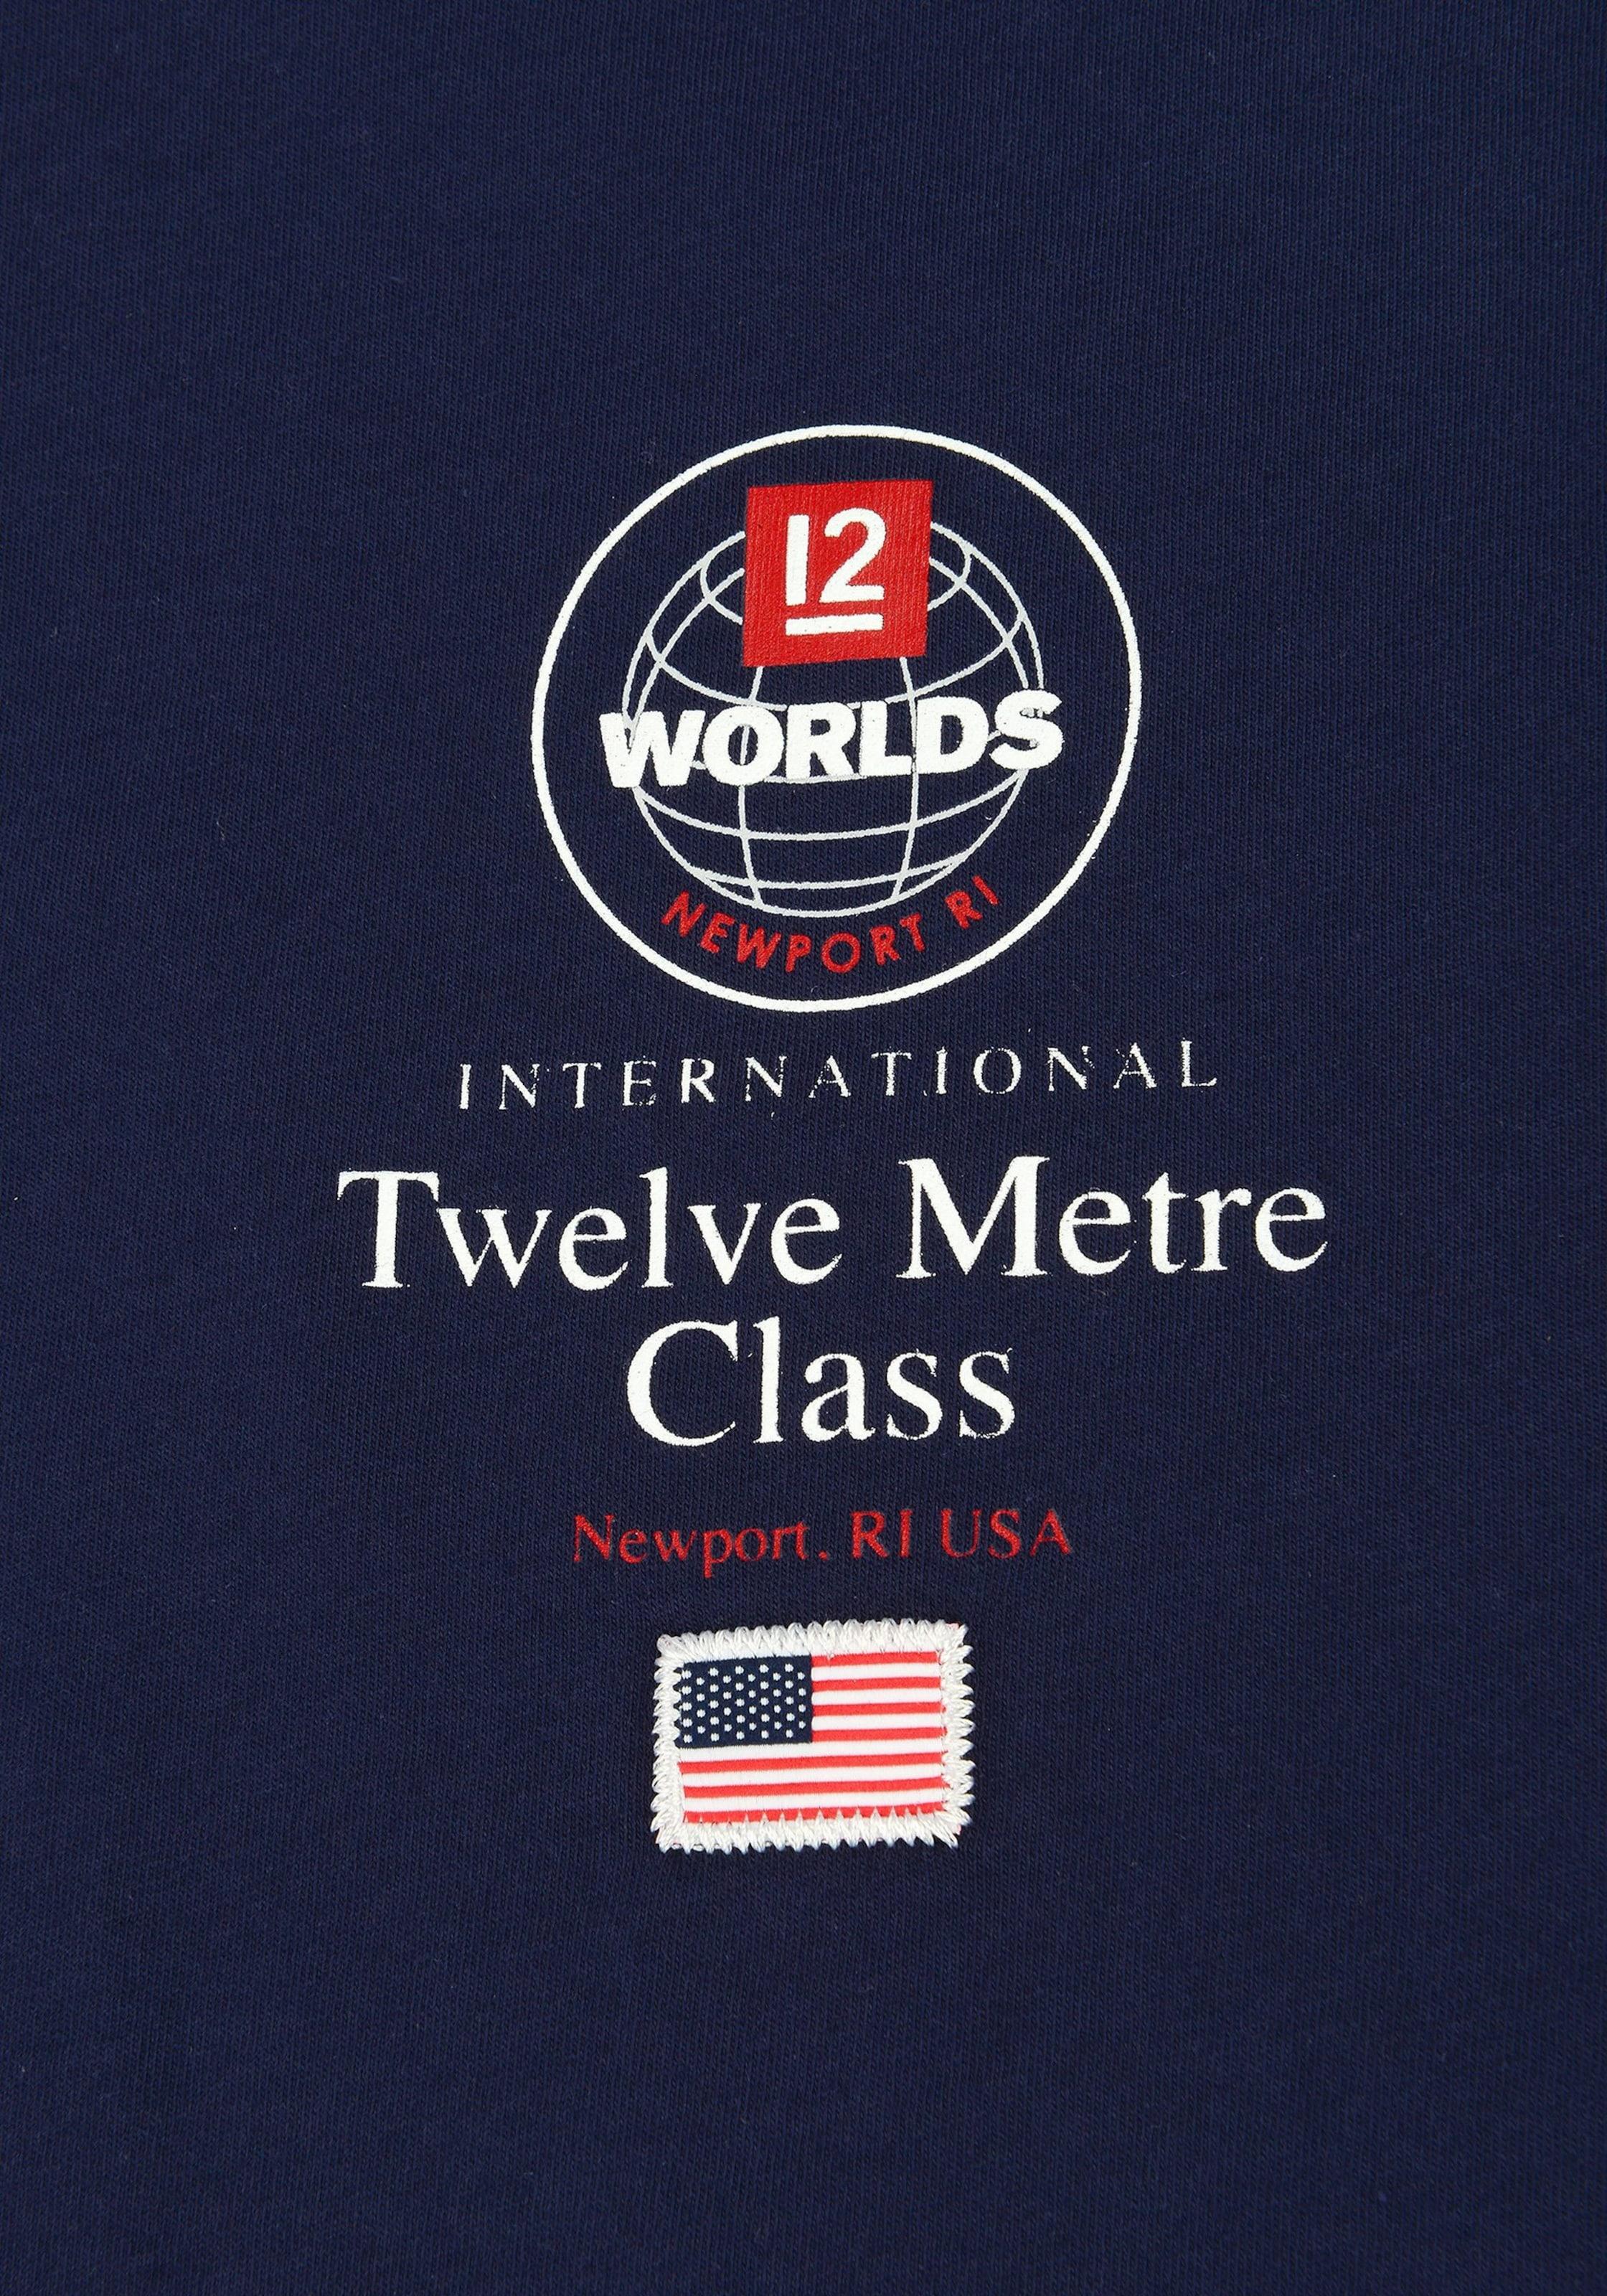 zero Dunkelblau 'ss 12m In Rhode BlauUltramarinblau shirt Code Island' T trCQsdh